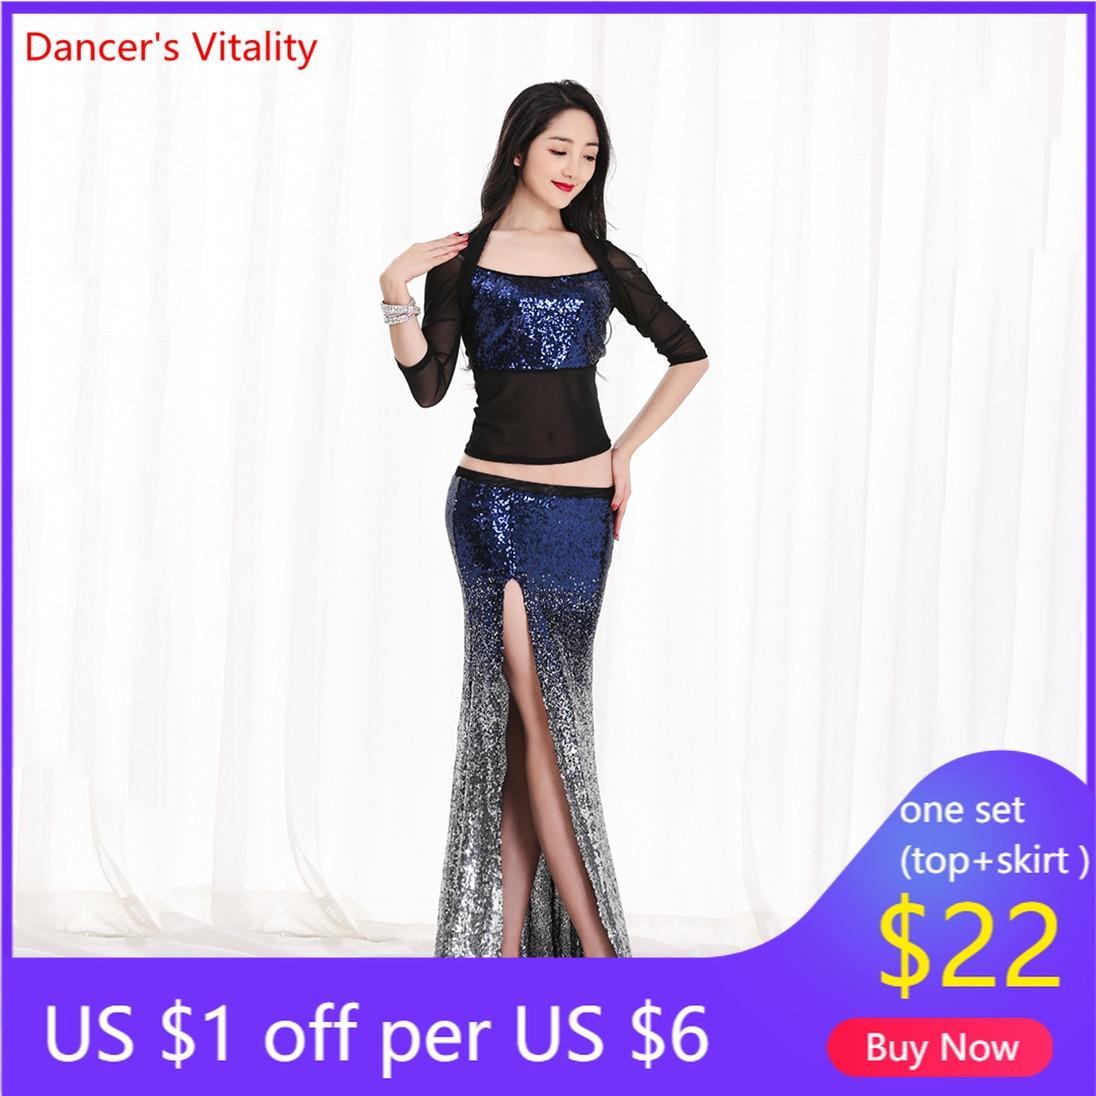 Women New Belly Dance Set  Oriental Dance Dance Competition Sequin   Costume Top+Fishtail  Skirt 2pcs Gypsy Skirt   Costume Set